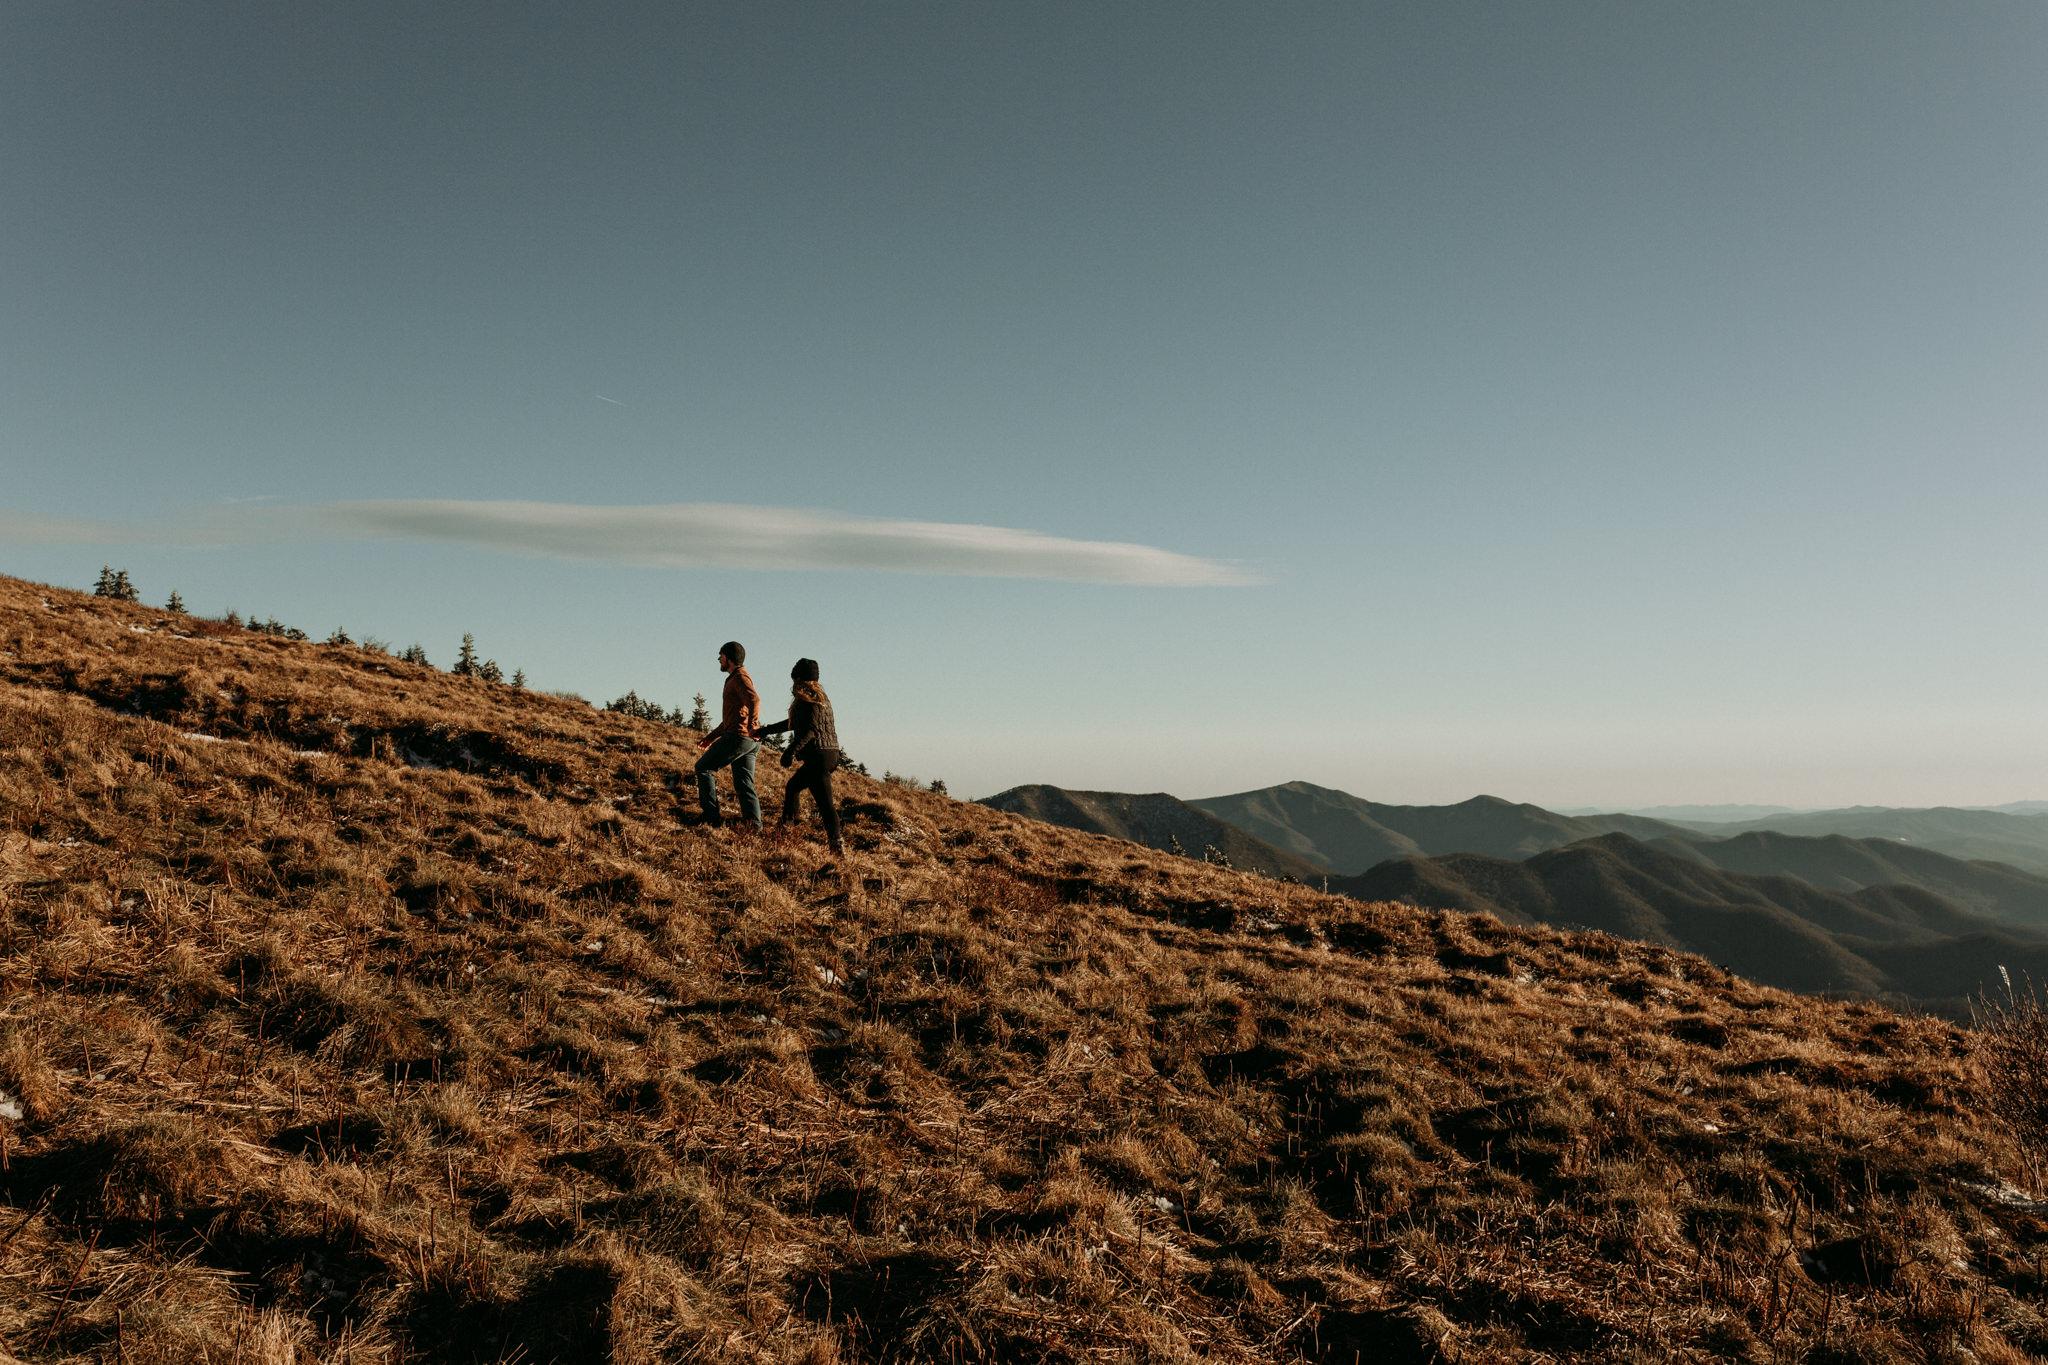 MonicaLeavellPhoto-AshleyMitch-NorthCarolina-Adventure-Engagement-Photographer-23.jpg